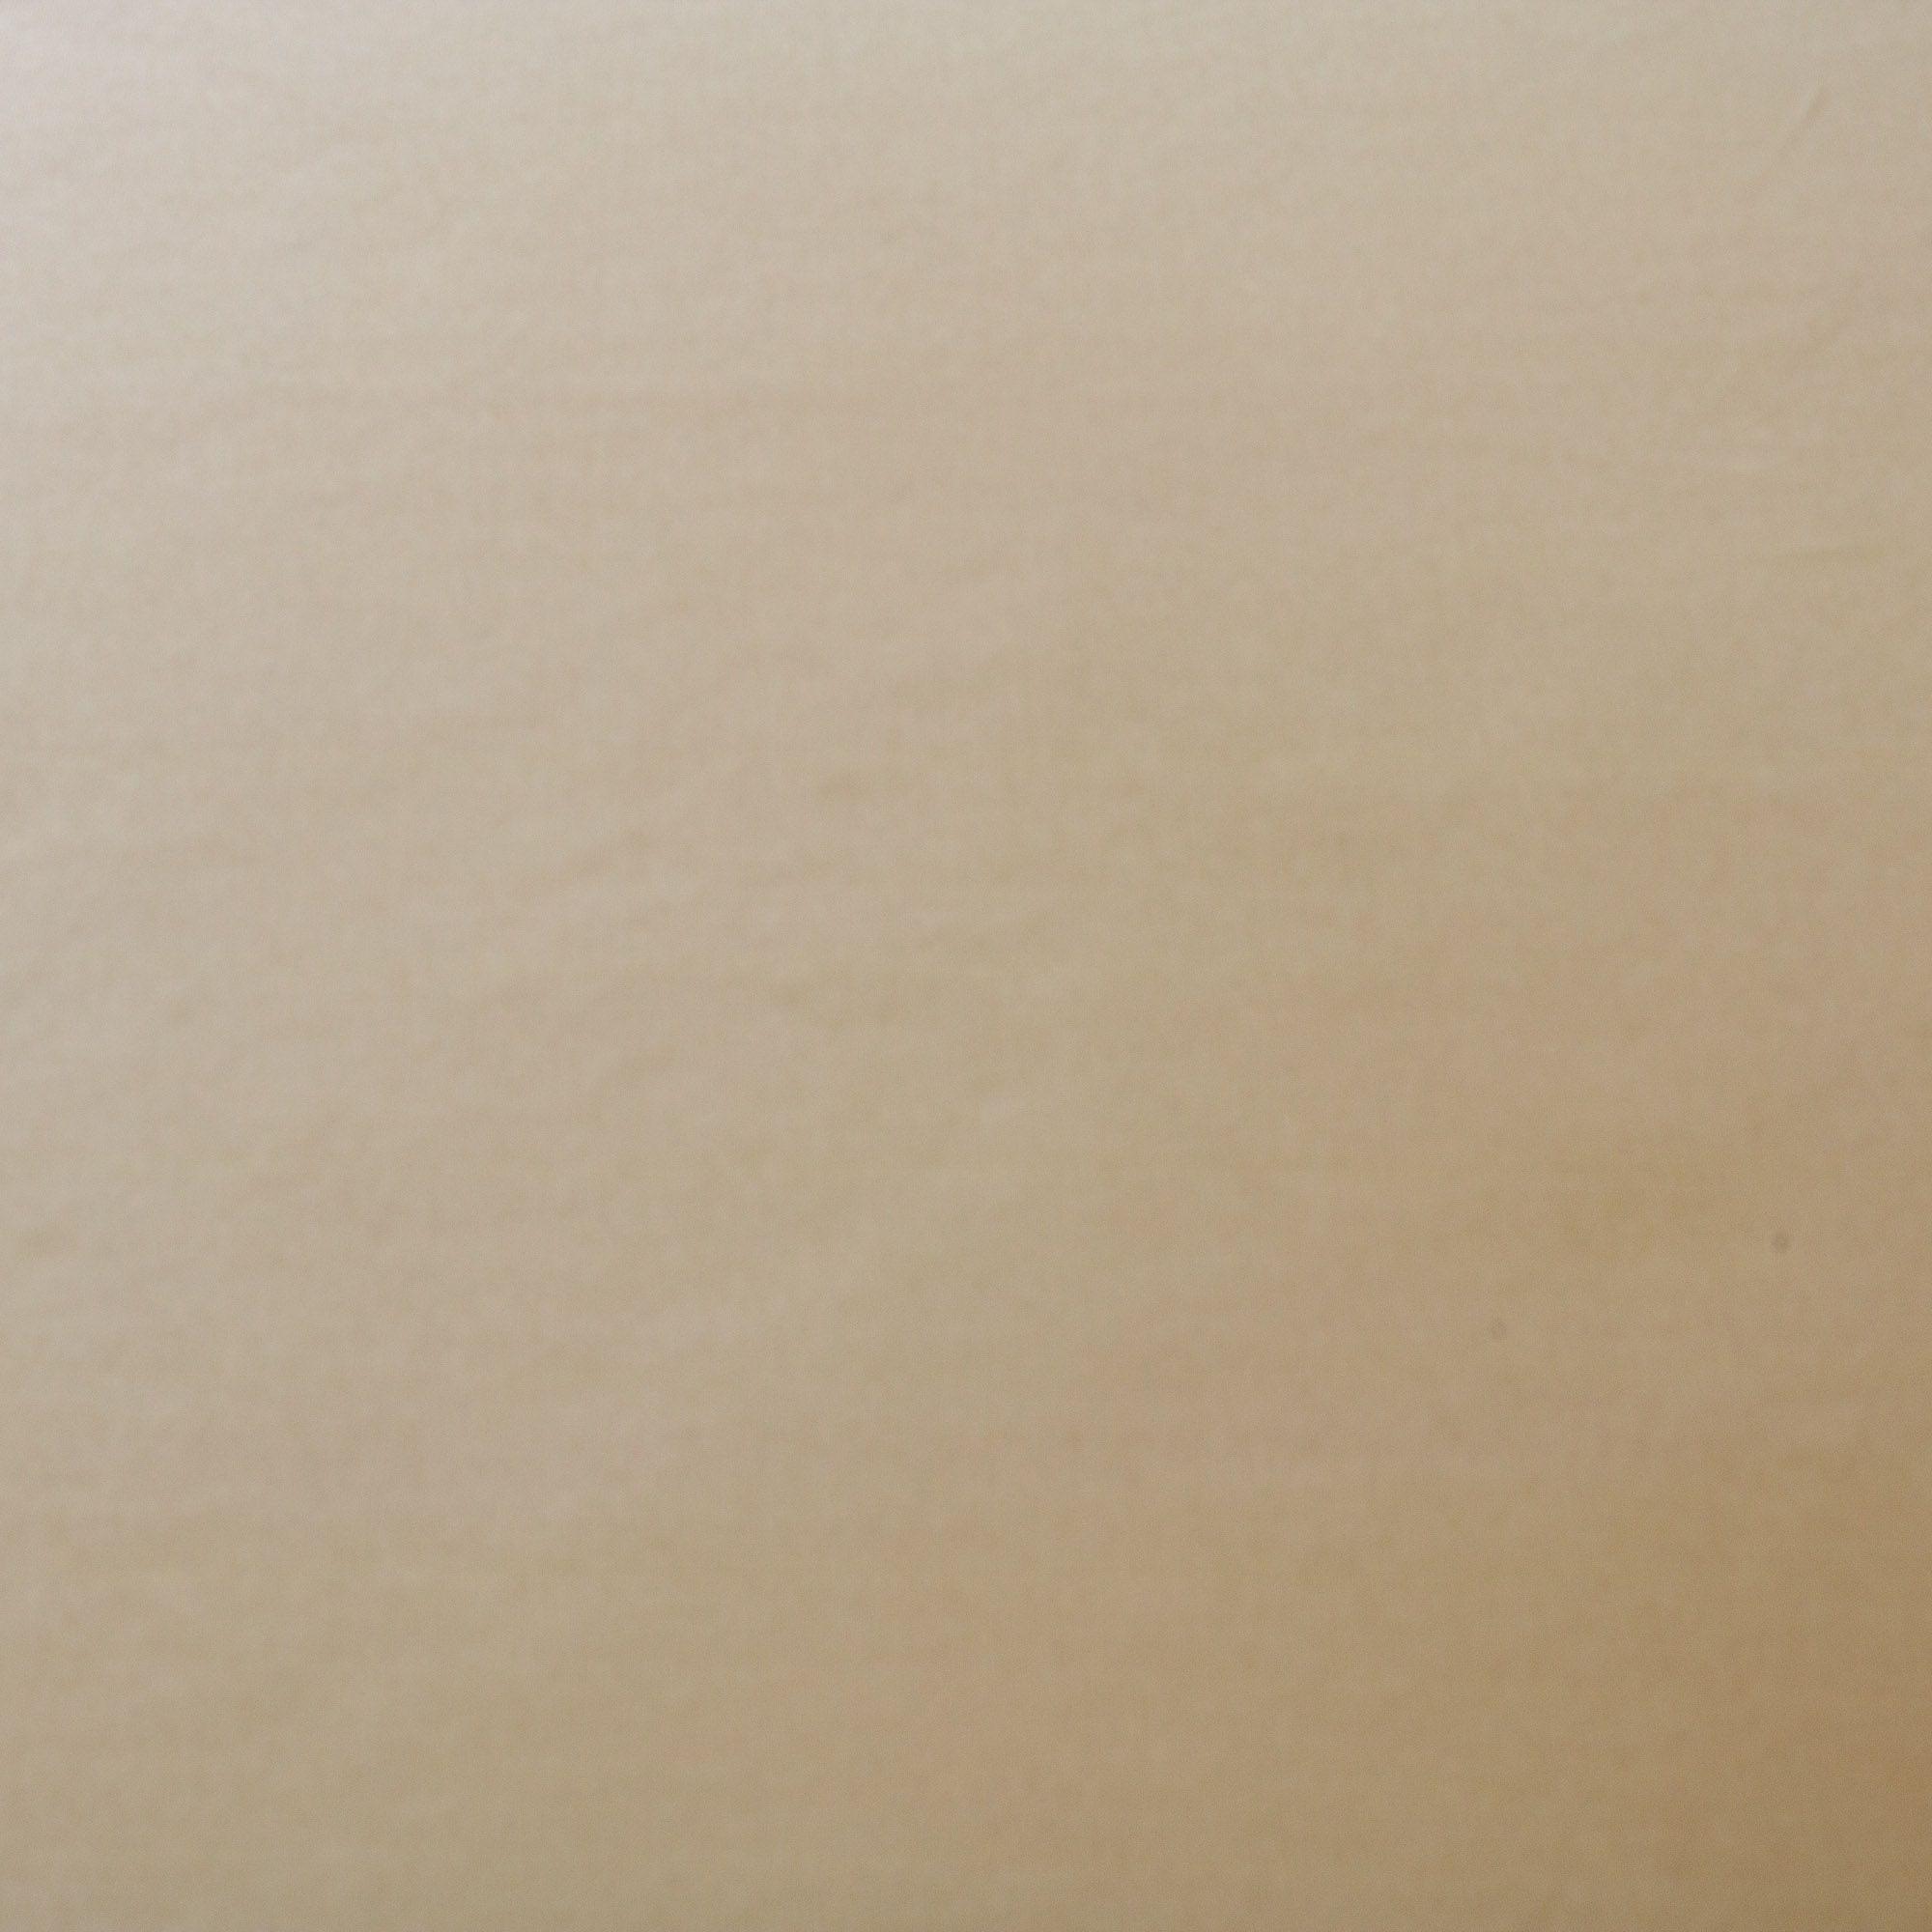 Tecido Malha Helanca Light Bege 100% Poliester 1,80 mt Largura